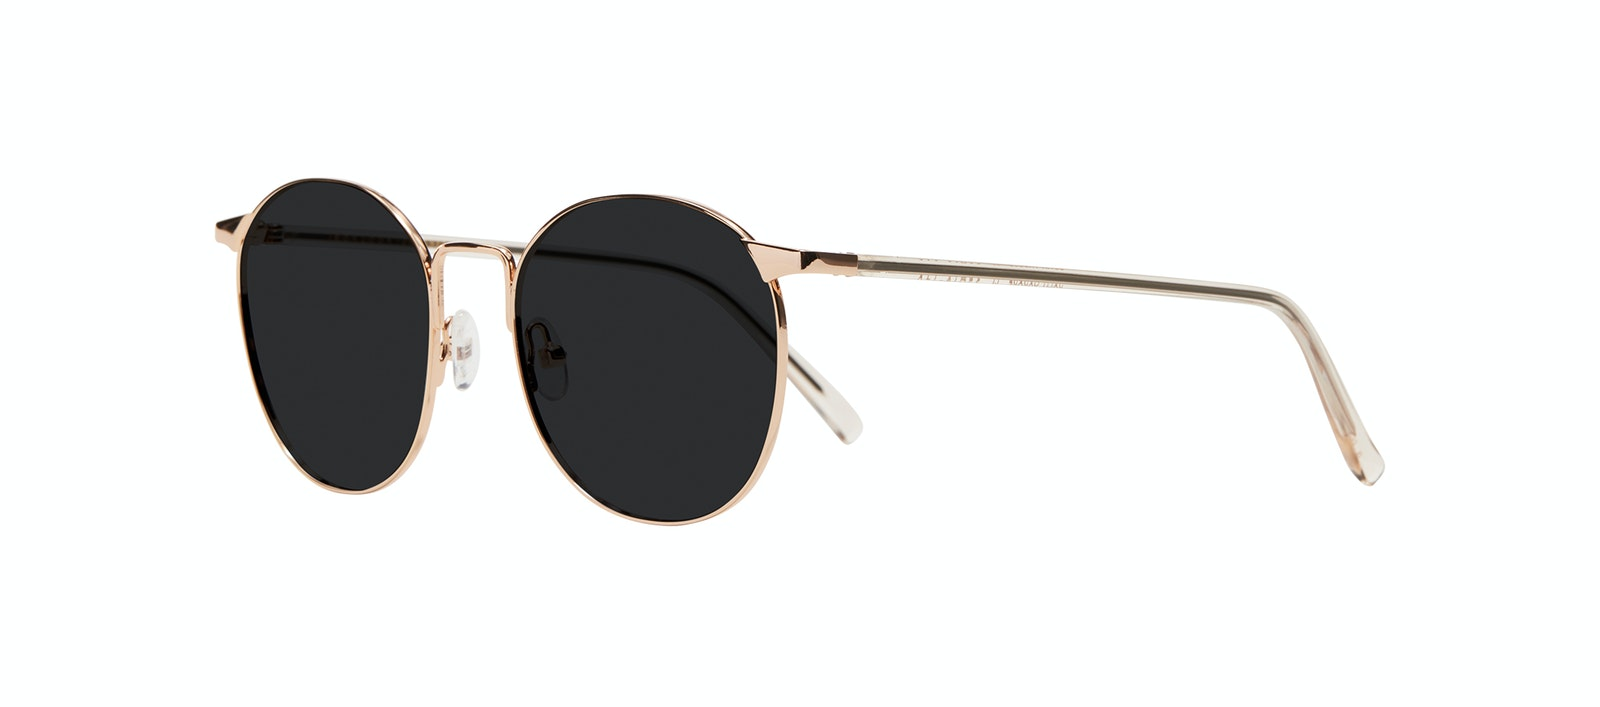 Affordable Fashion Glasses Round Sunglasses Women Romy Petite Aurore Tilt